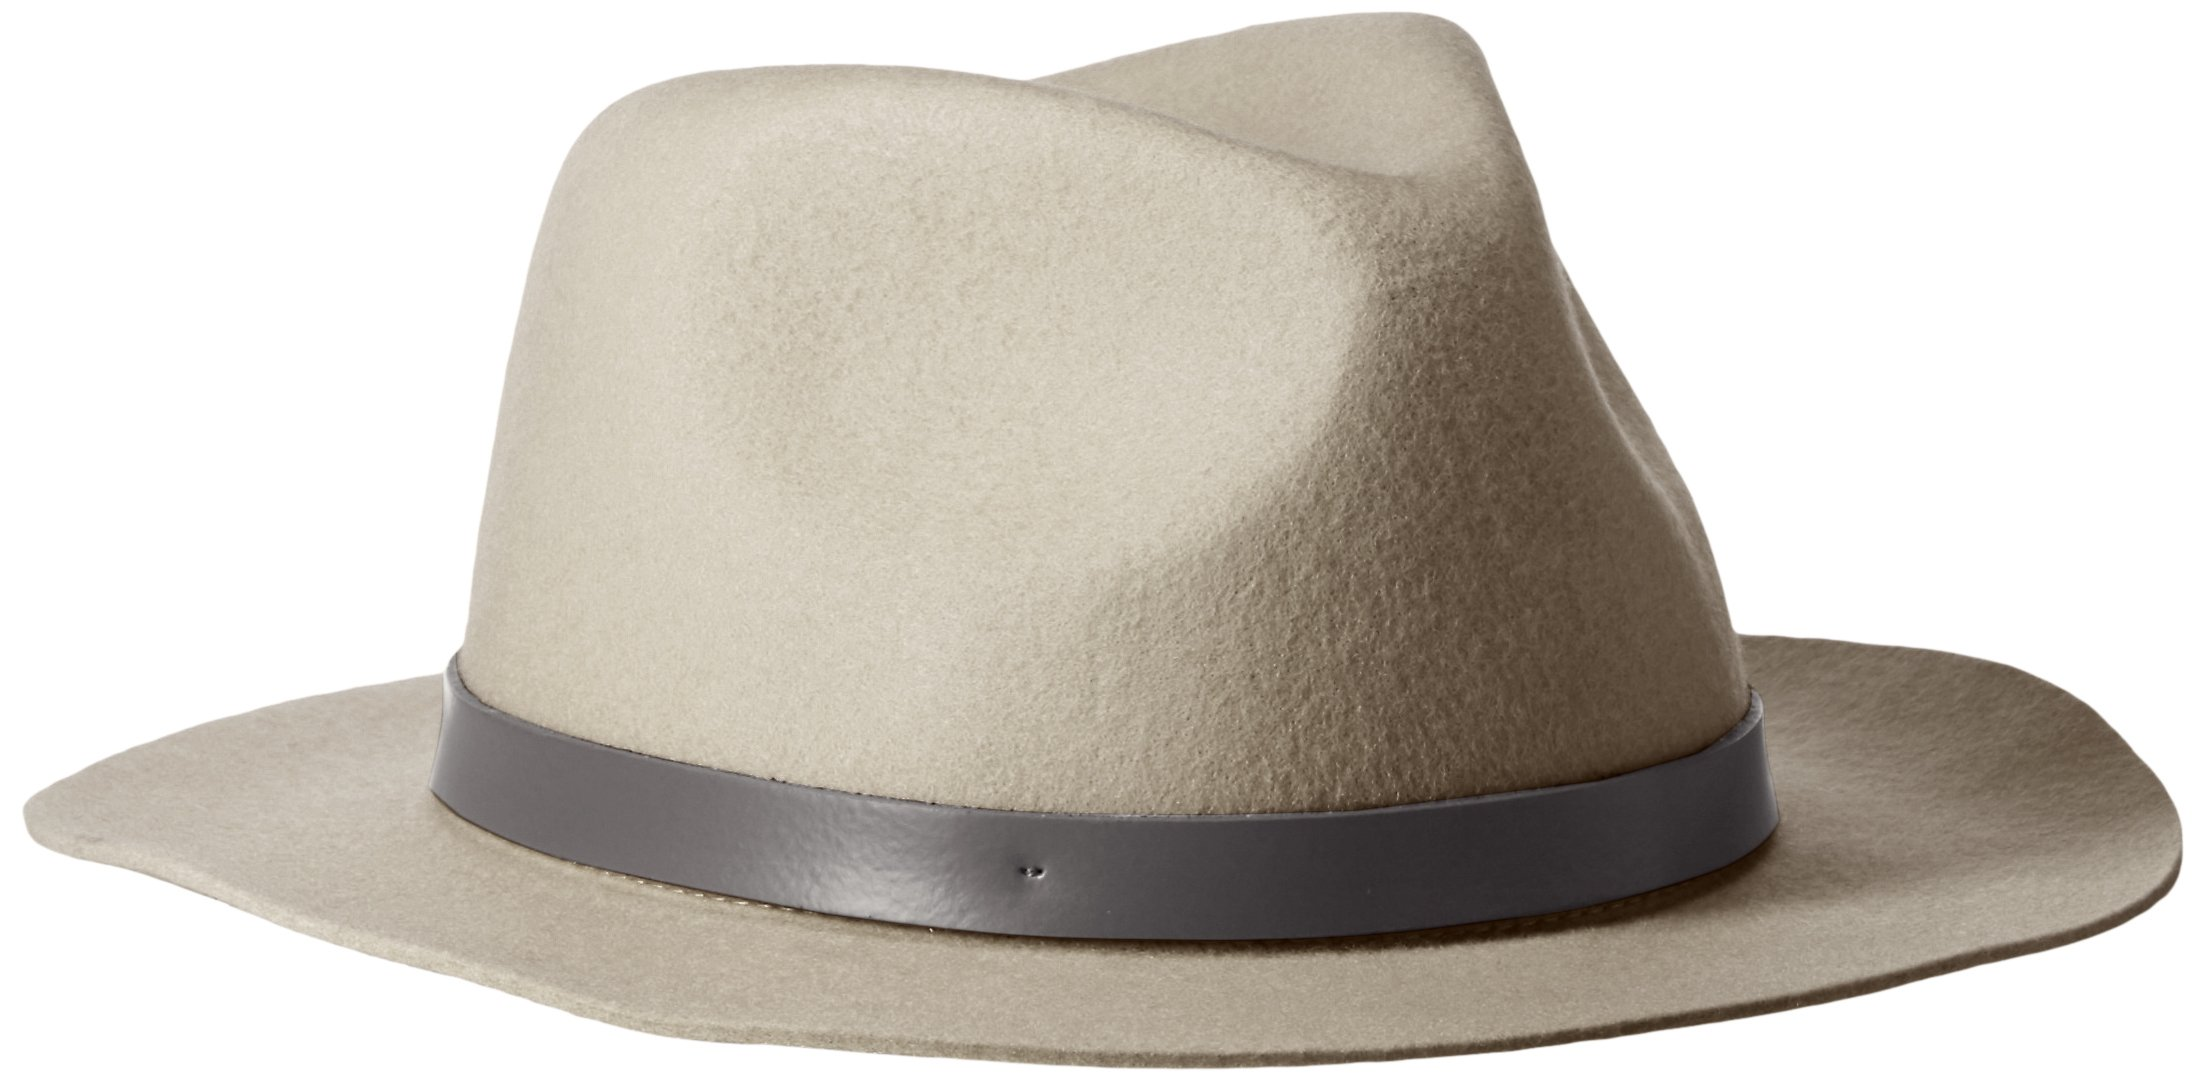 Phenix Cashmere Women's Short Brim Wool Felt Fedora Hat, Dove Grey, One Size